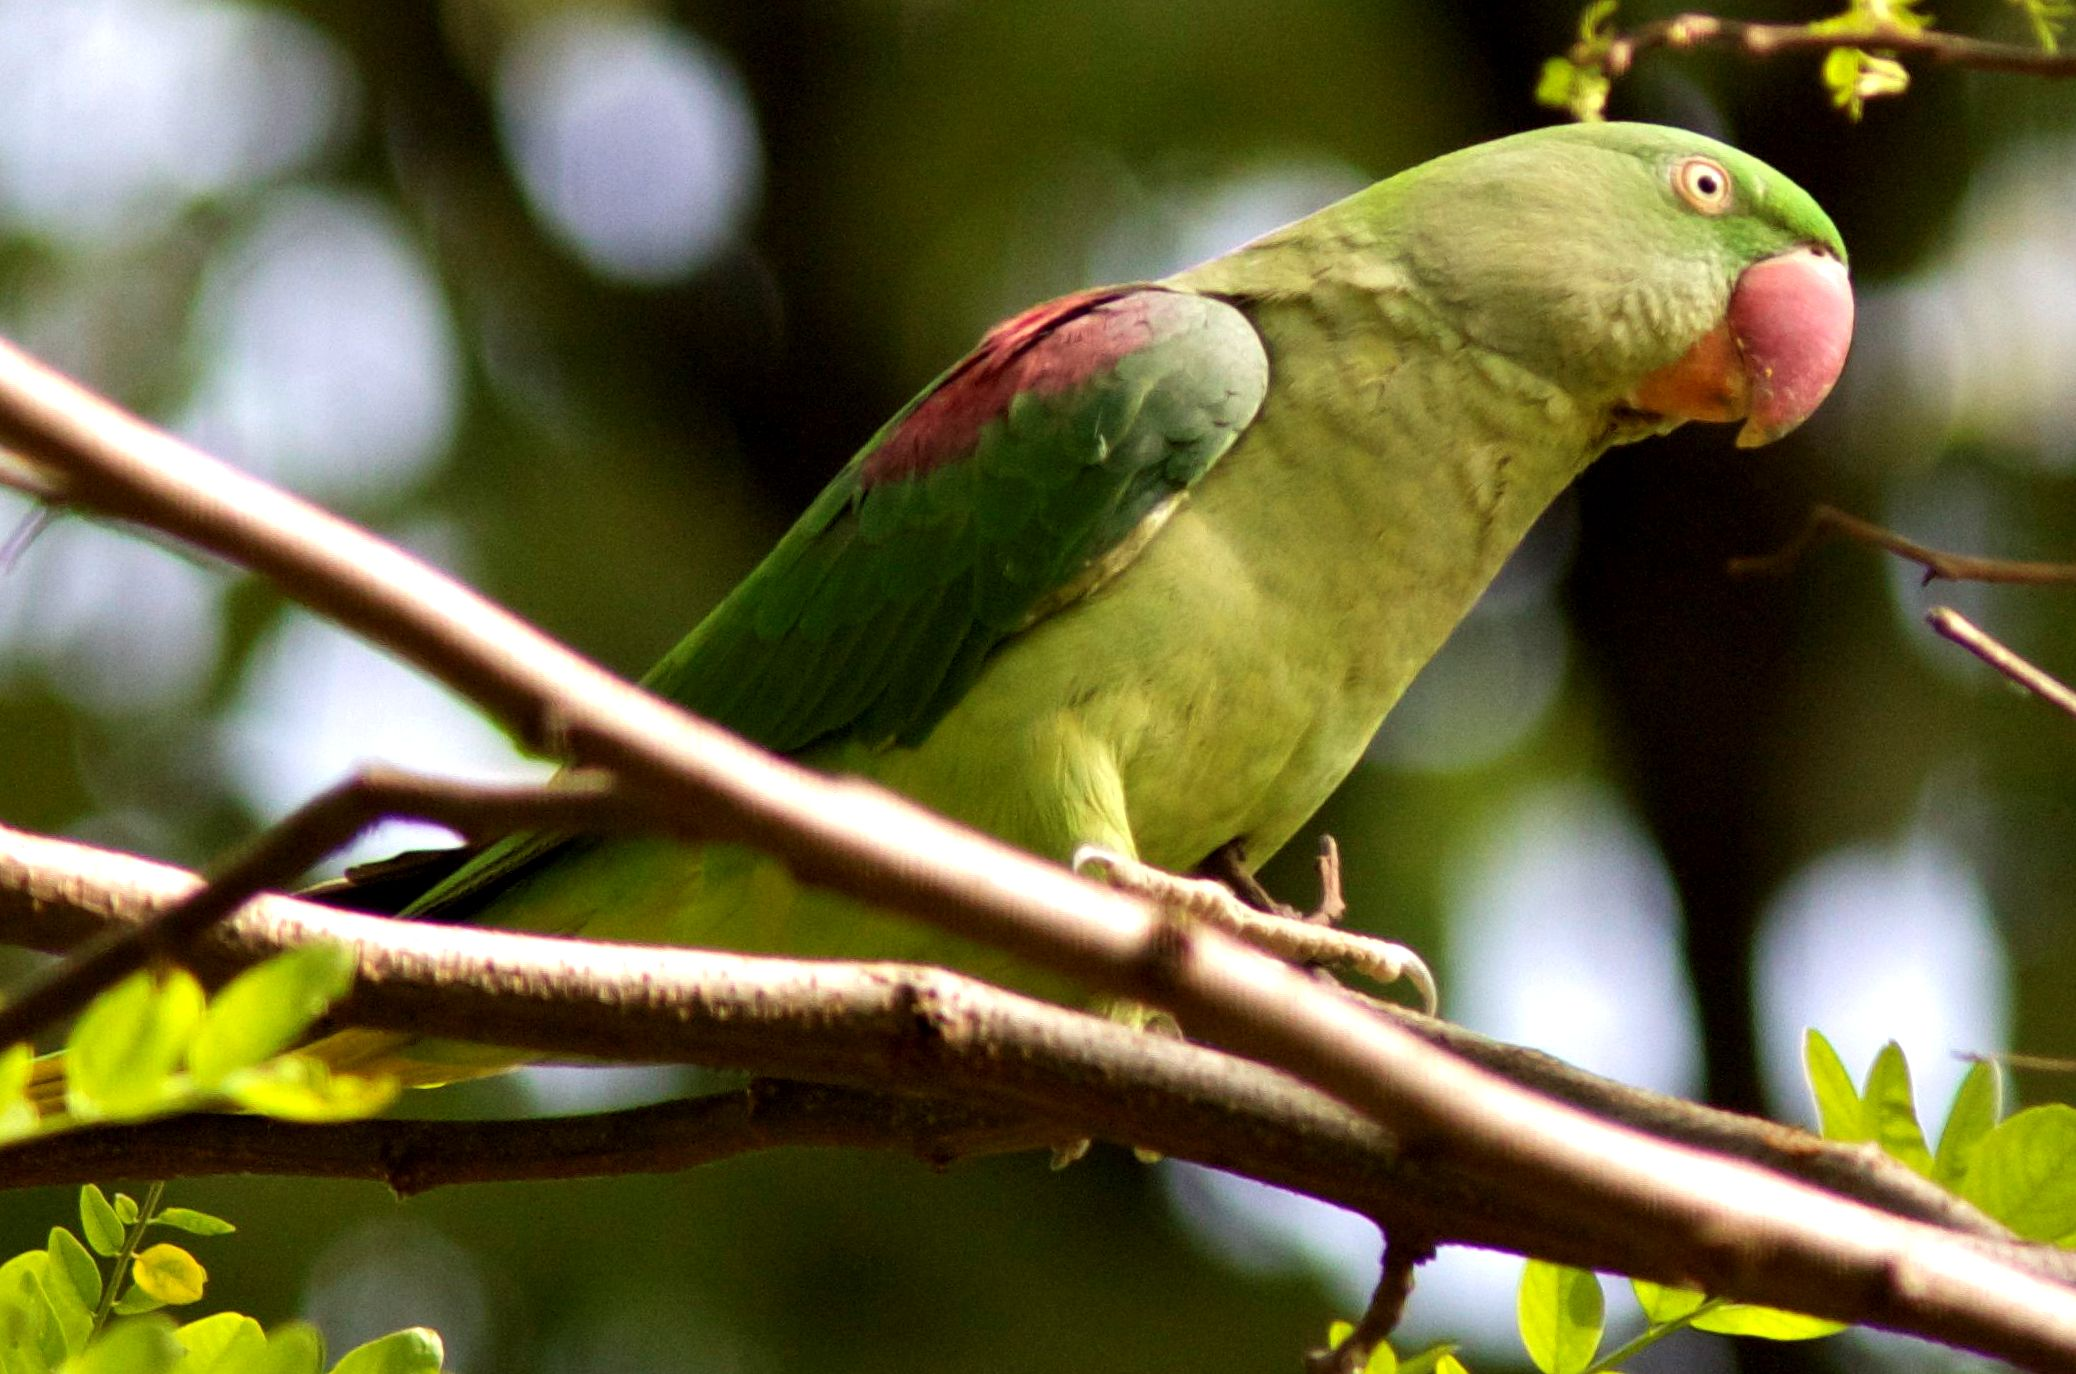 Nagy Sándor papagáj